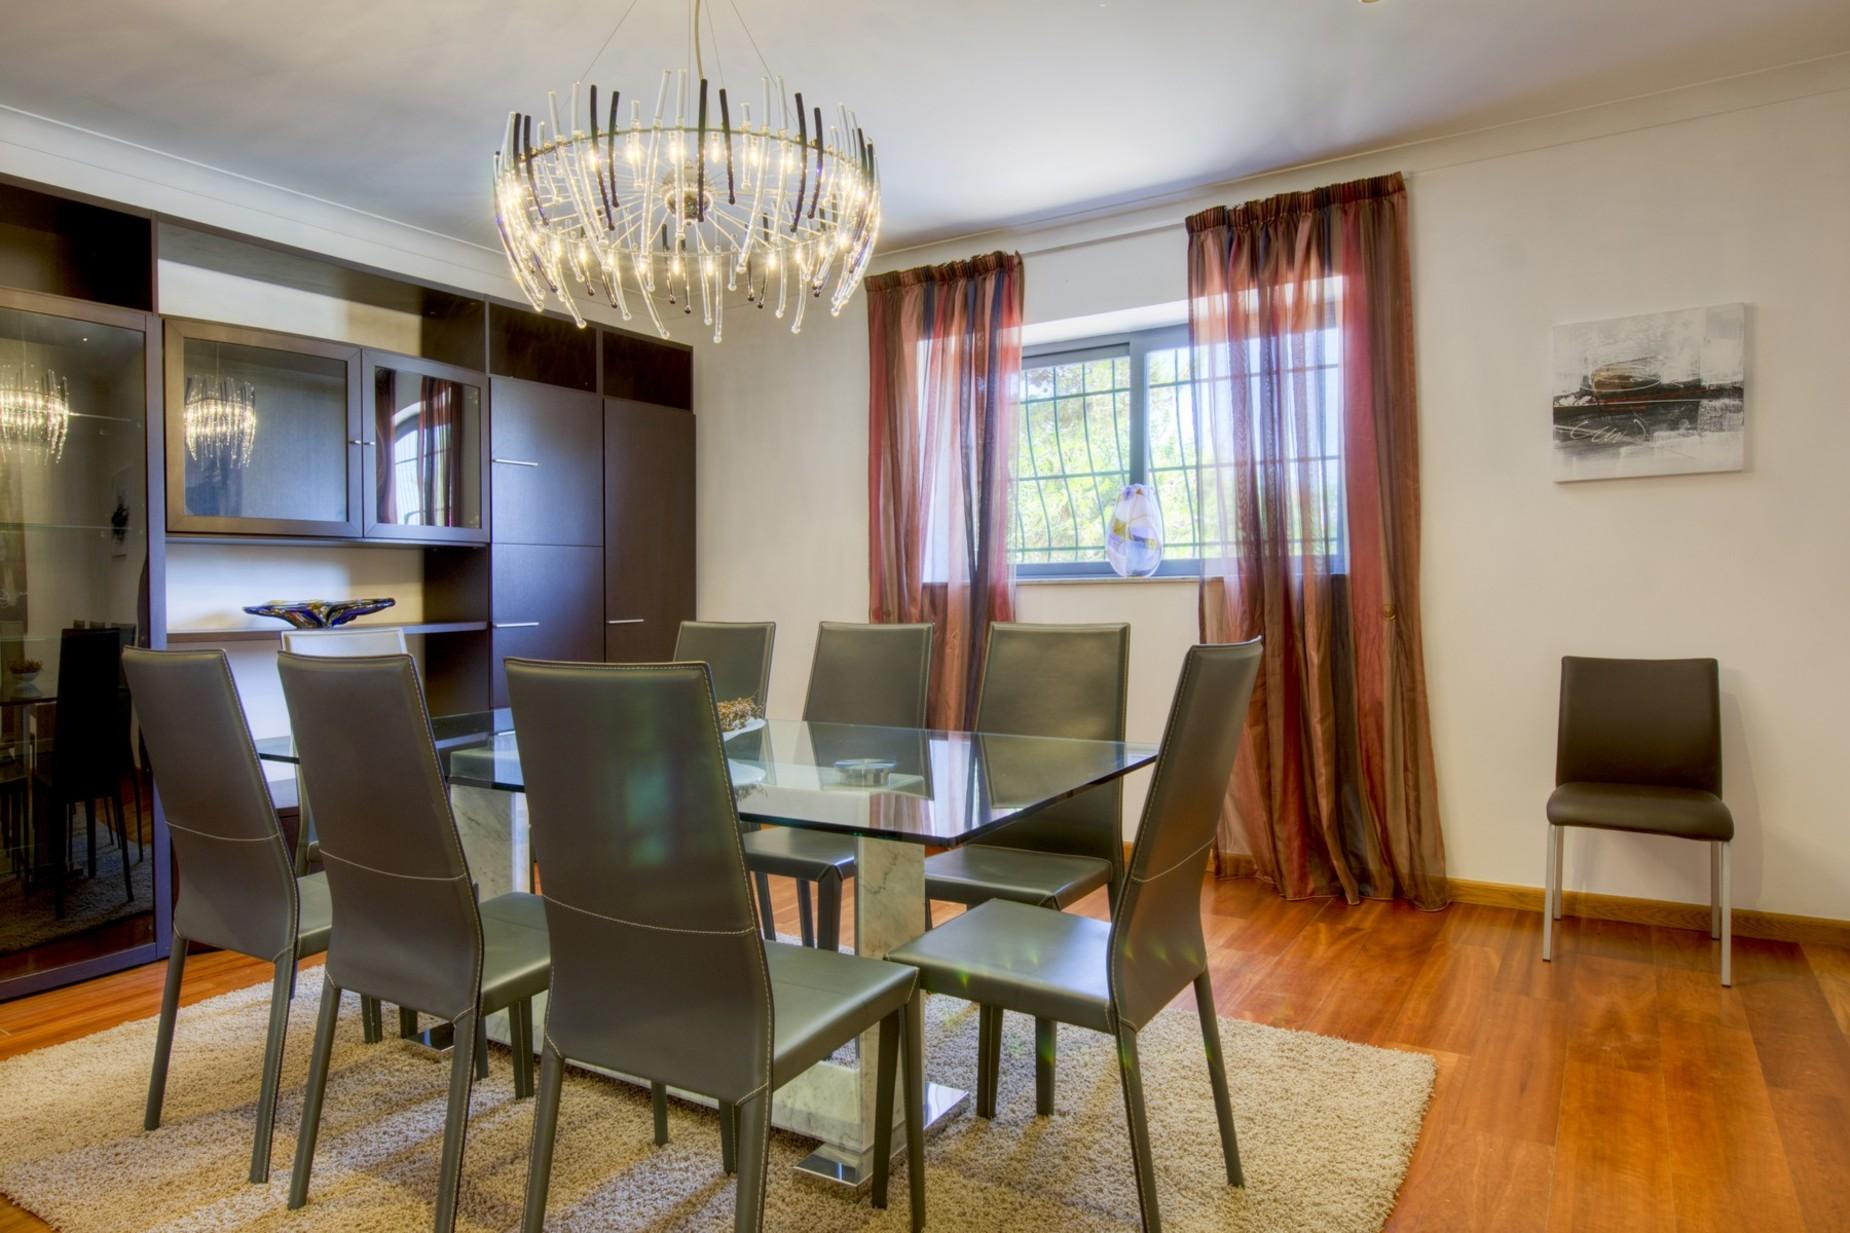 4 bed Villa For Sale in Bahar ic-Caghaq, Bahar ic-Caghaq - thumb 6